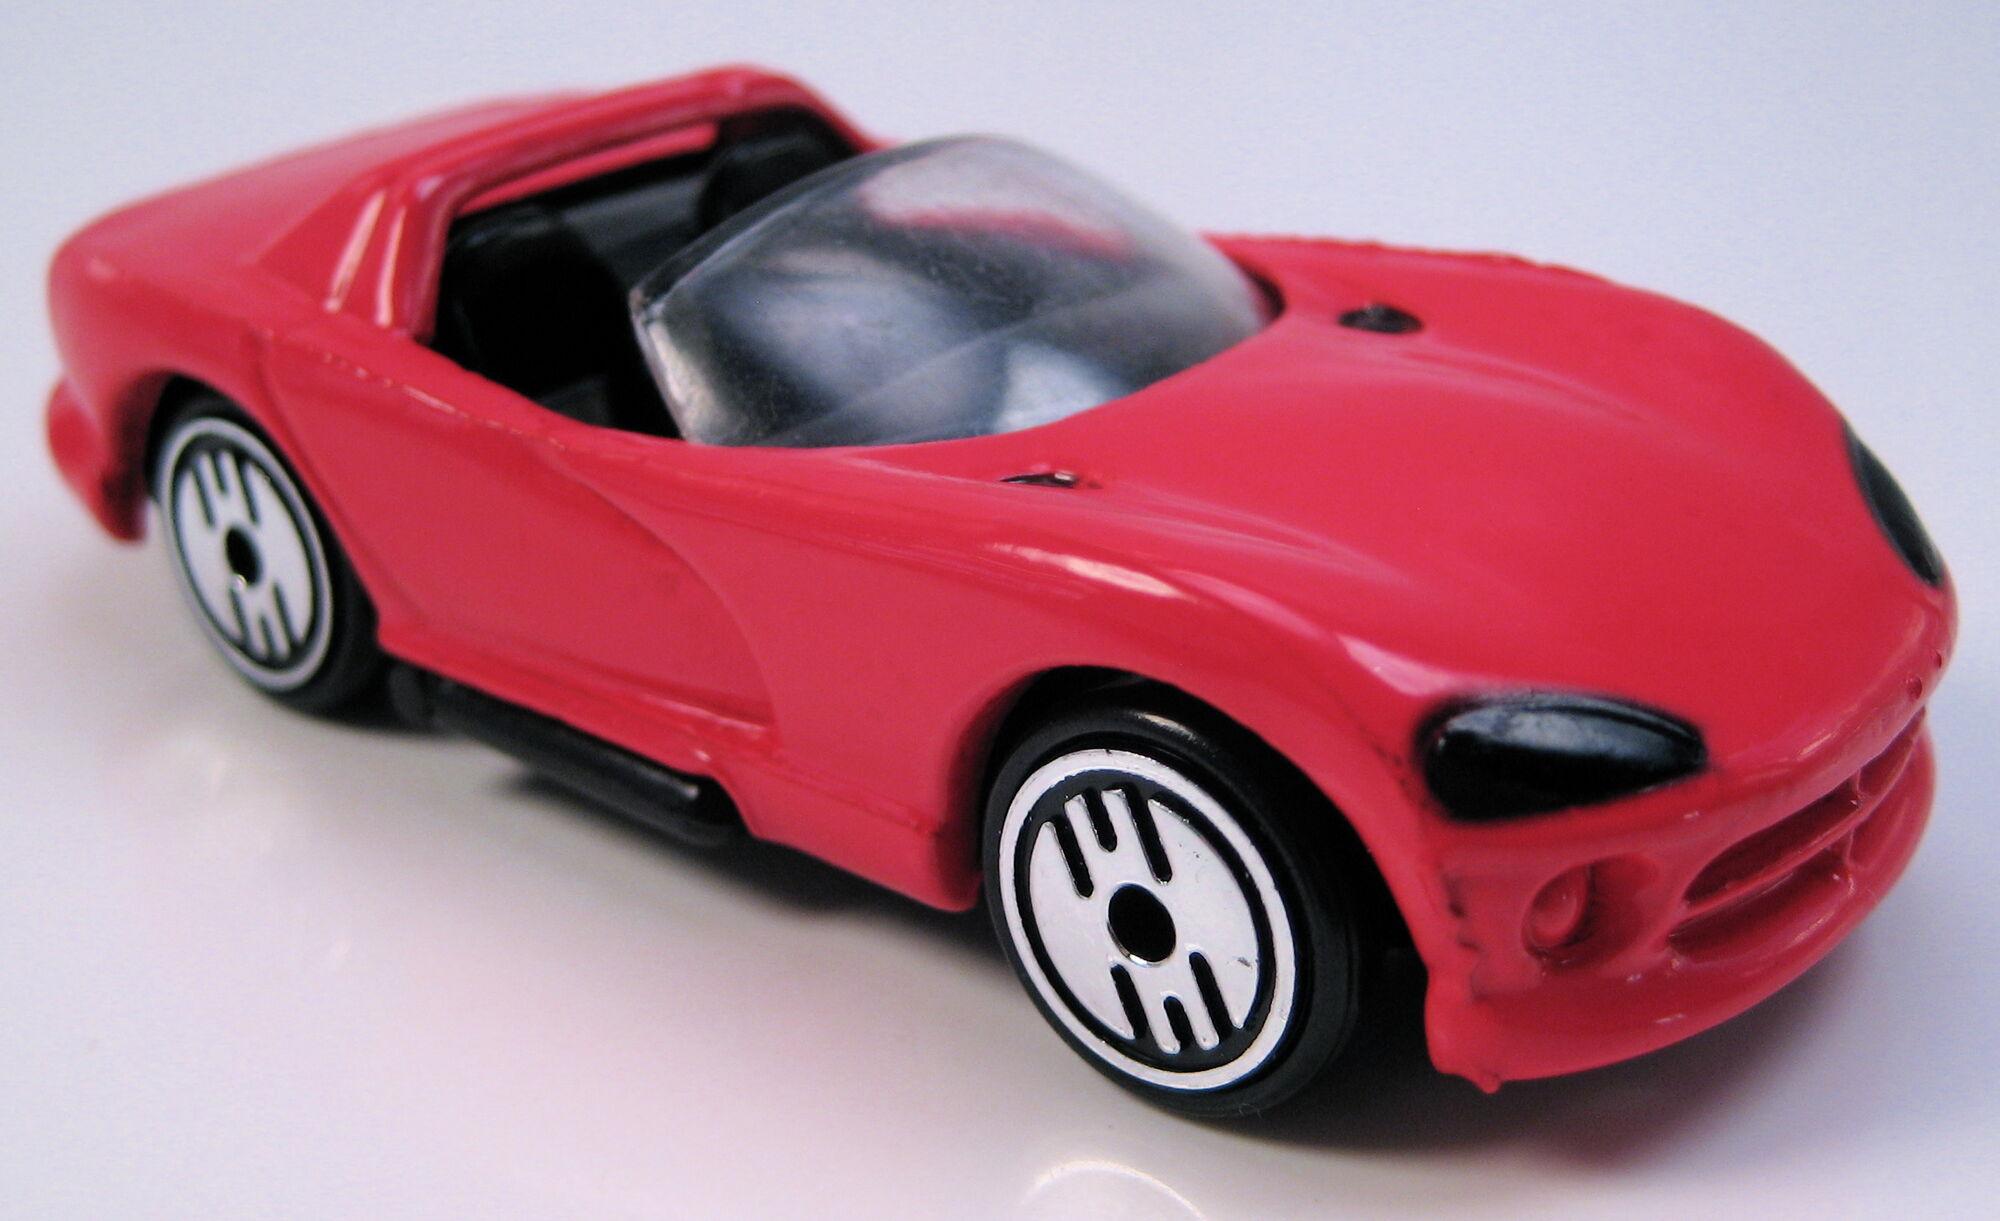 Dodge Viper Rt 10 Hot Wheels Wiki Fandom Powered By Wikia